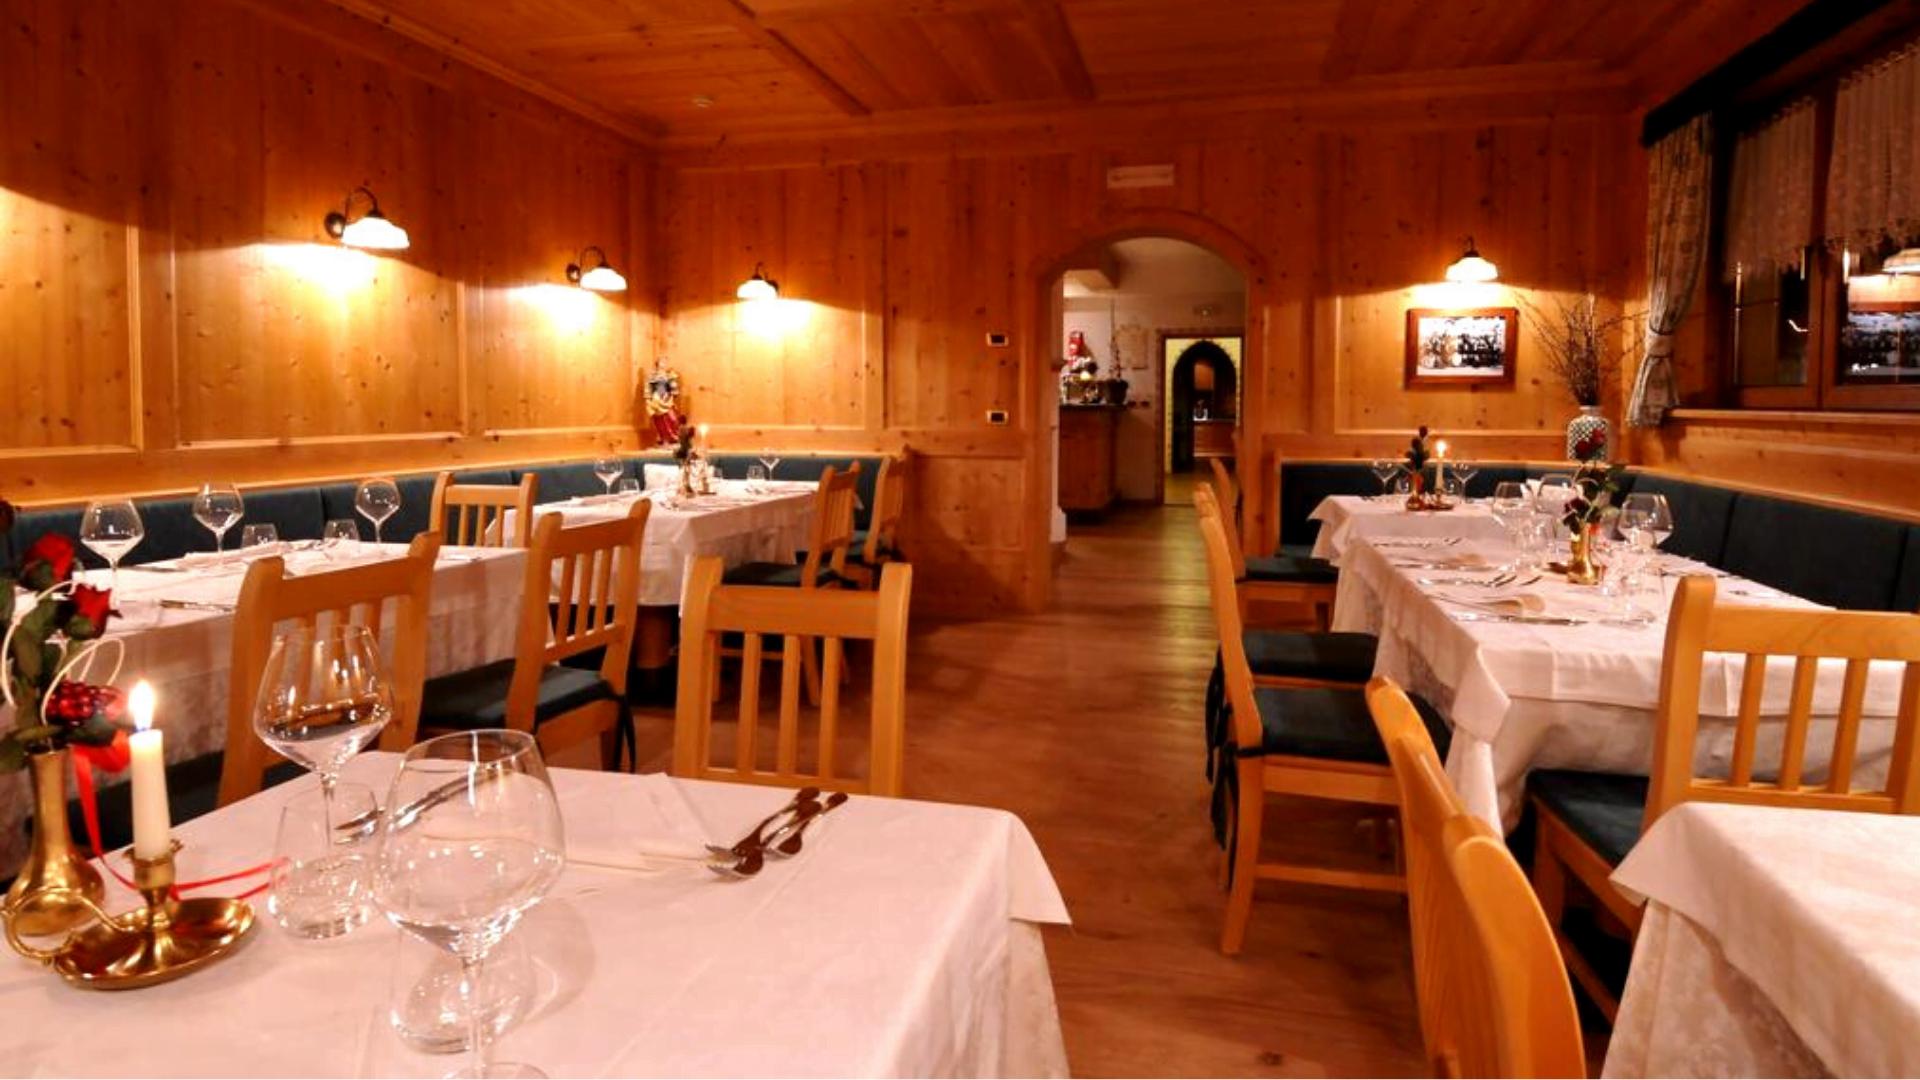 Valacia hotelli restoran